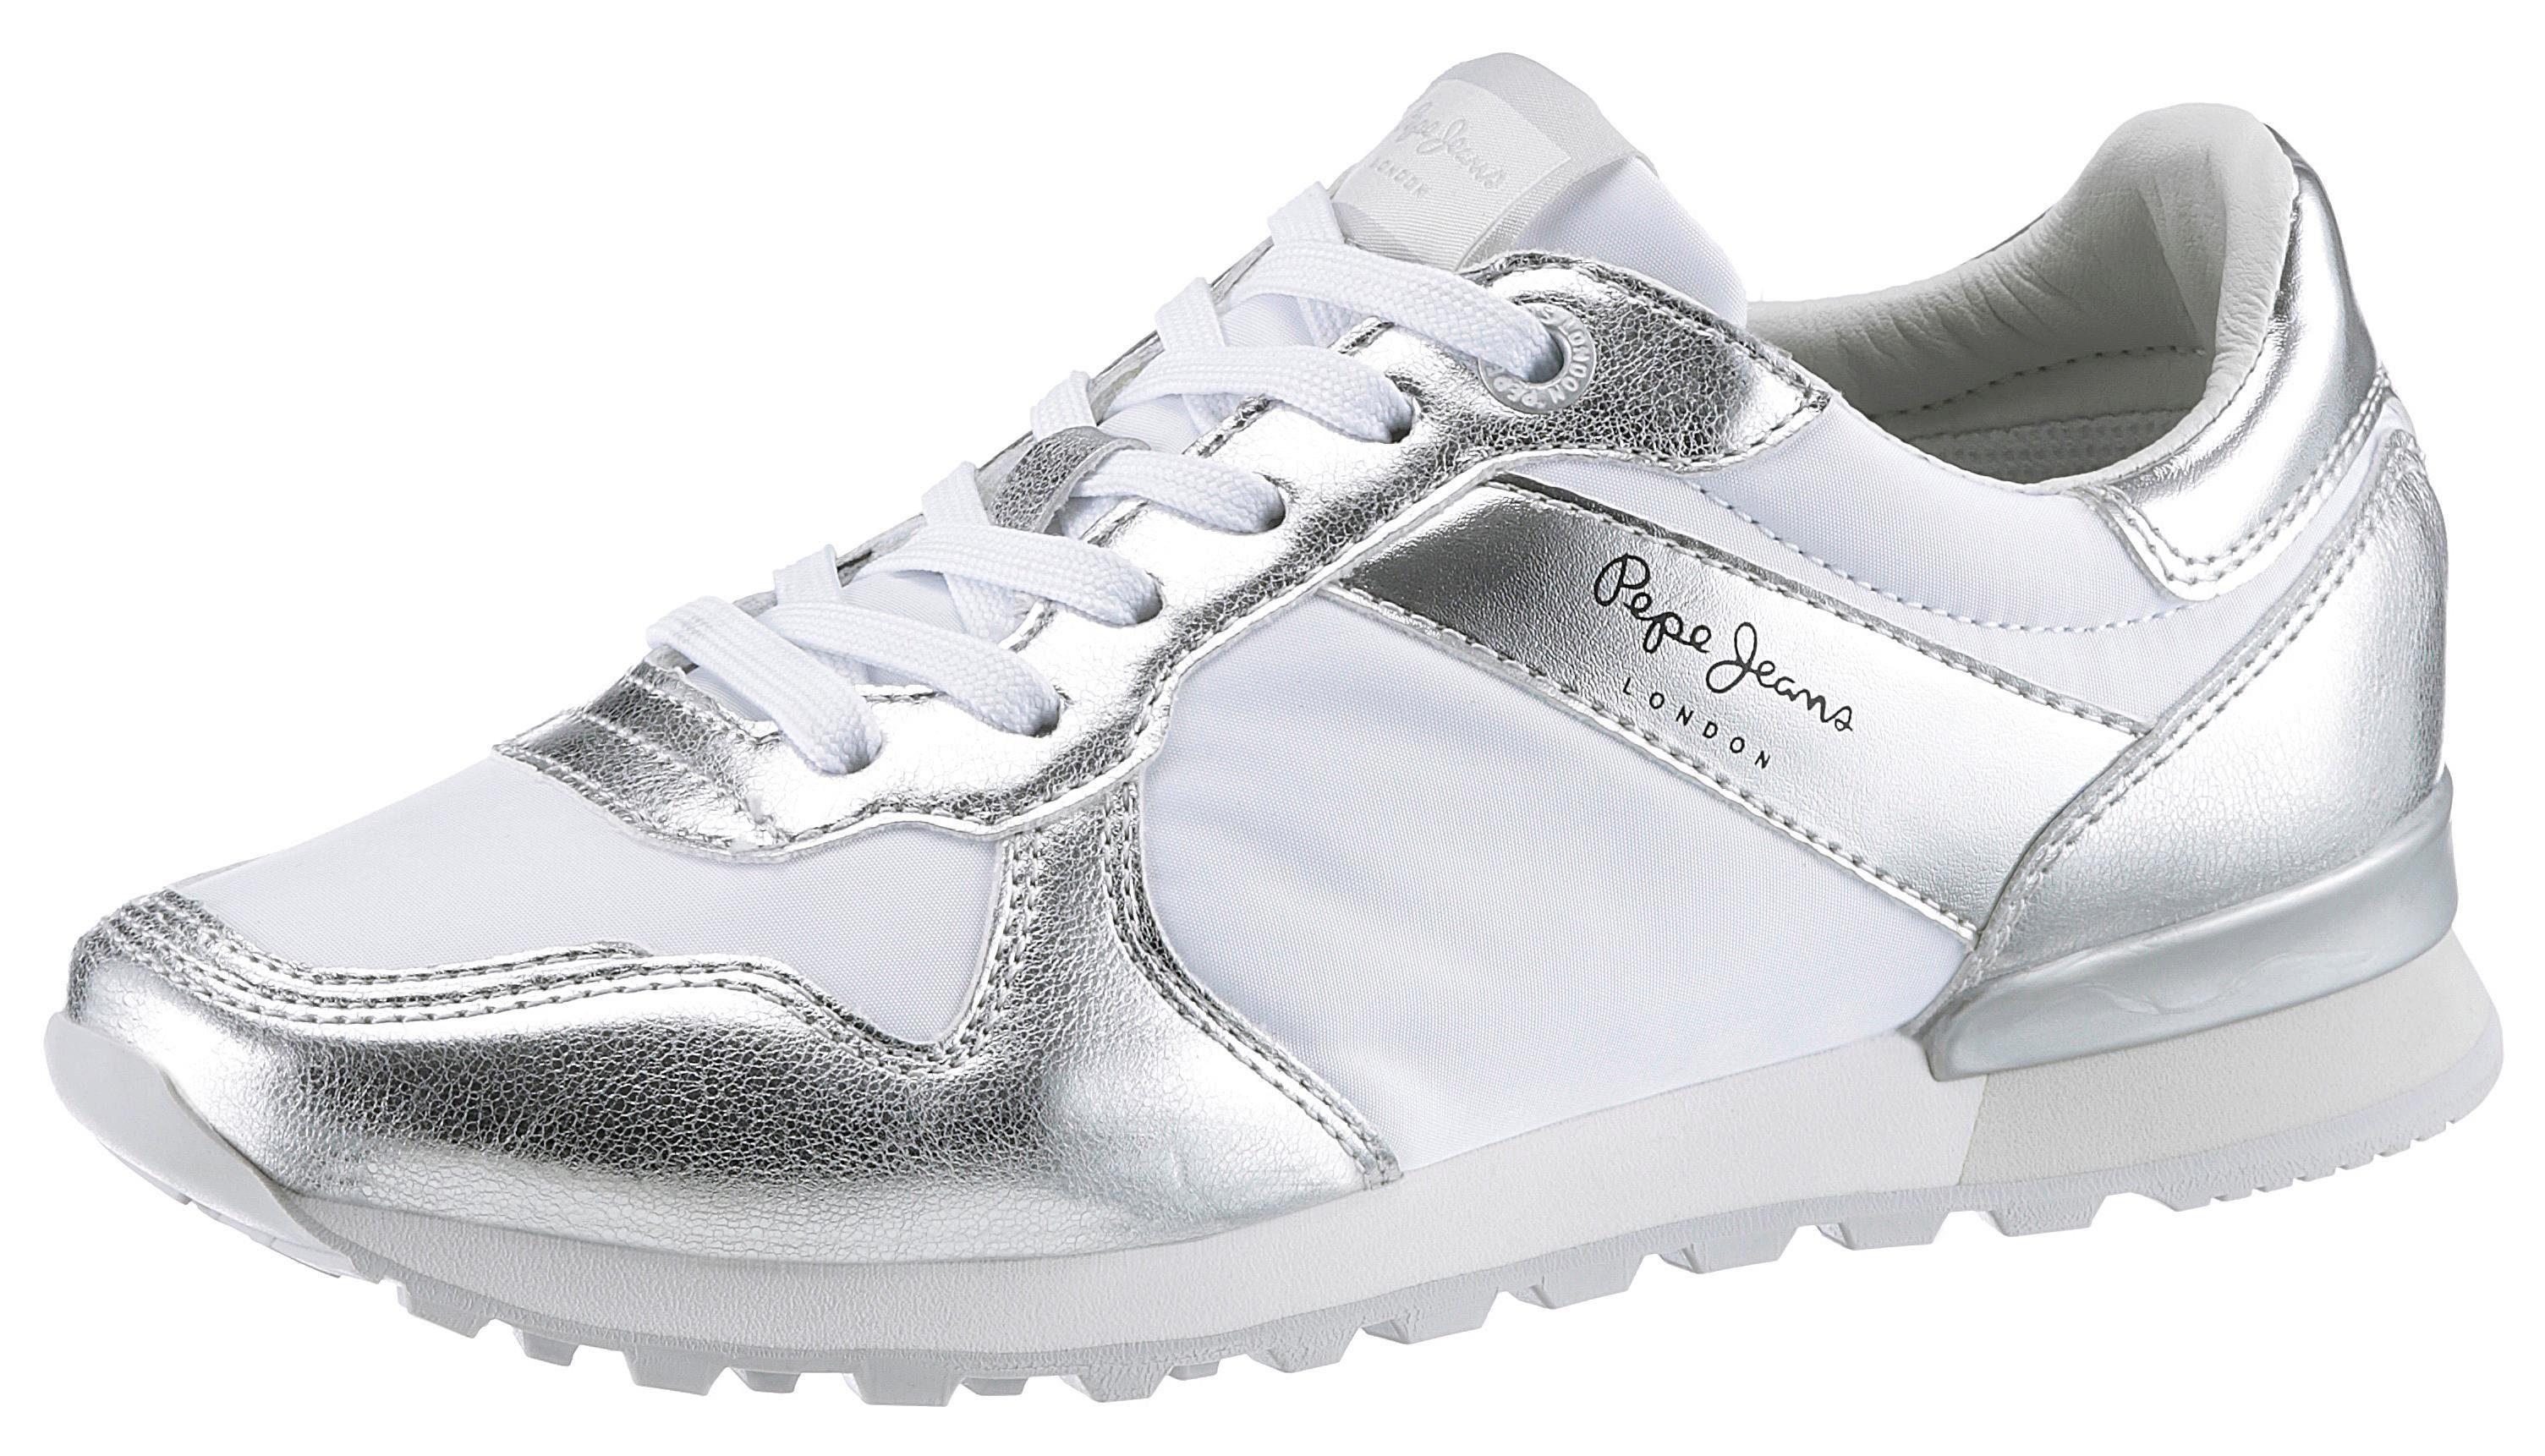 W Im Jeans Greek« Online KaufenOtto Sneaker Metallic Look Pepe »verona vP0mnw8yON